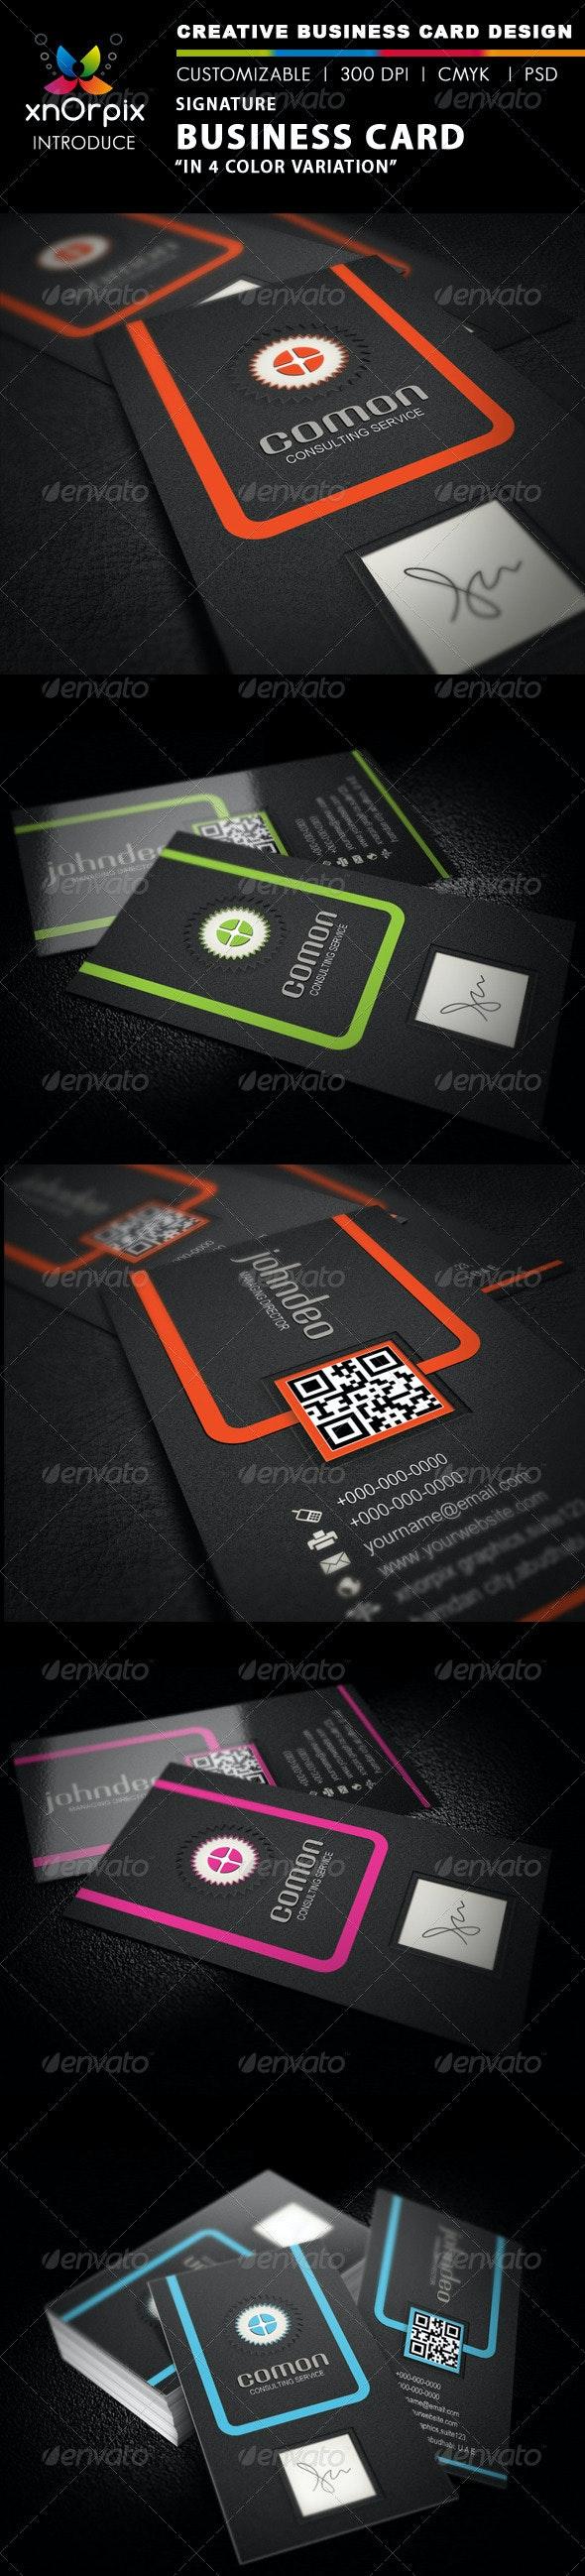 Signature Business Card - Corporate Business Cards